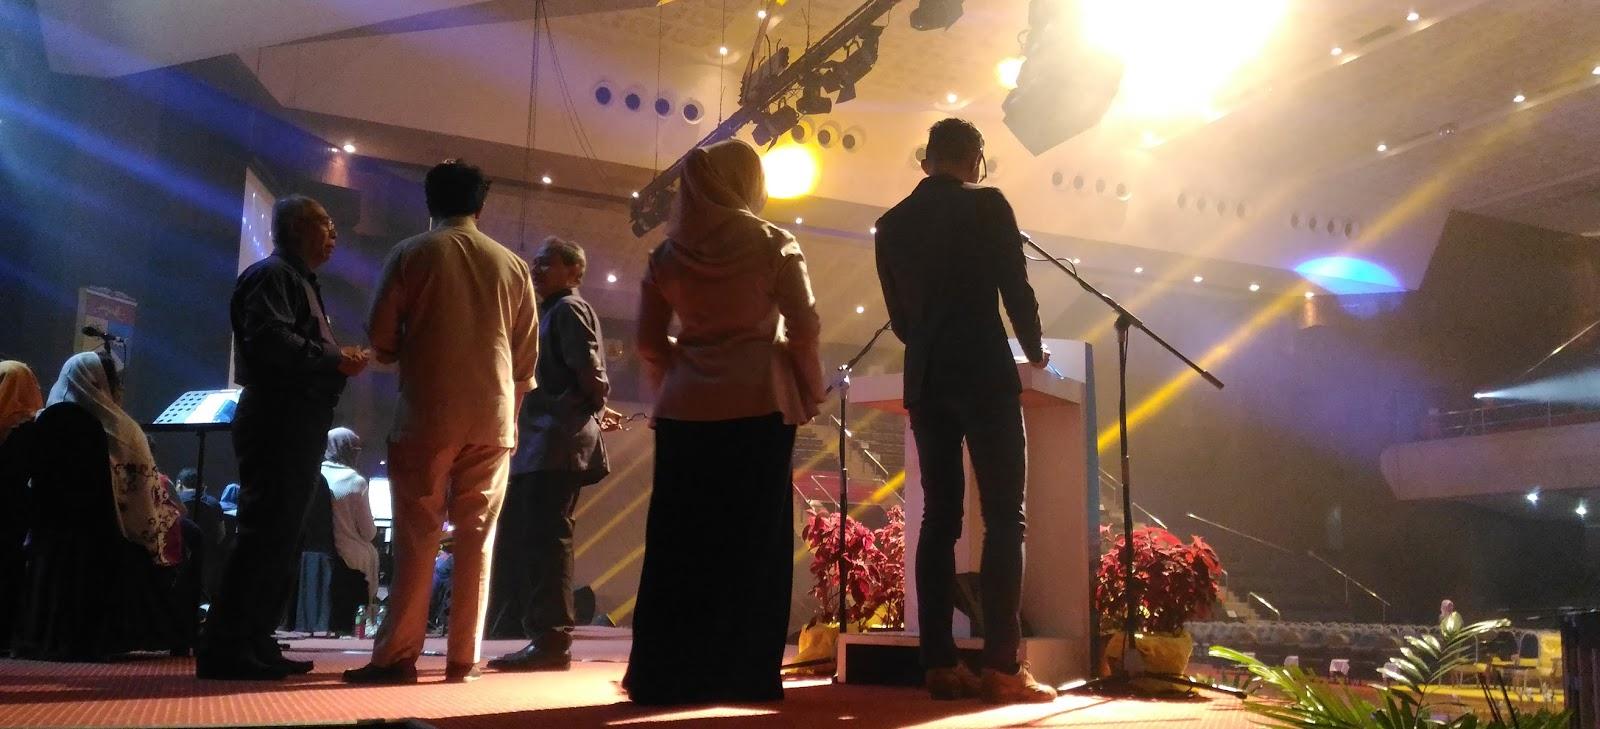 konsert di raja Kangar – raja perlis tuanku syed sirajuddin jamalullail berkenan berangkat ke konsert diraja sempena sambutan ulang tahun keputeraan baginda ke-72 di dewan 2020 di sini, malam tadi.